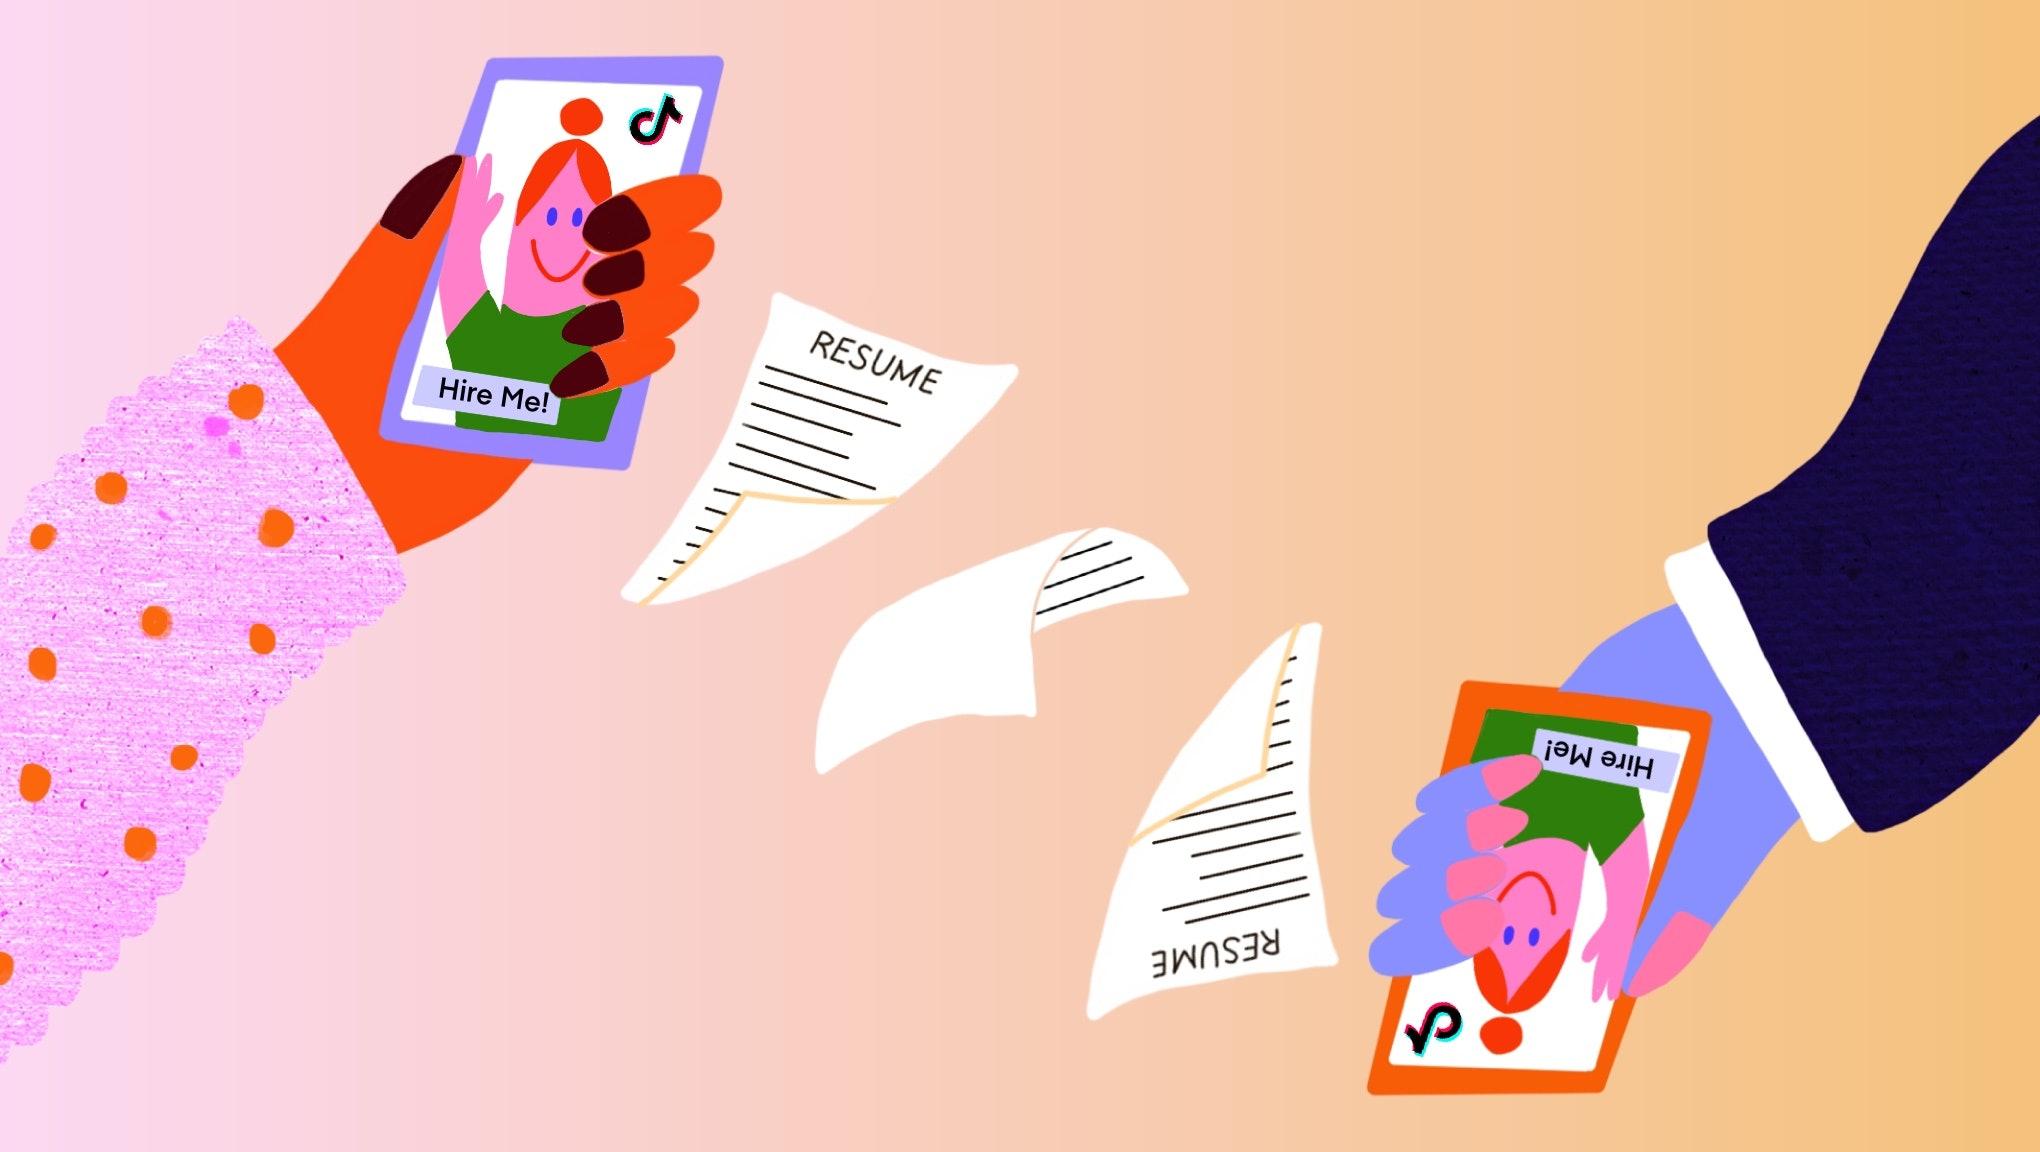 Can TikTok's new résumé feature really help you find a job?